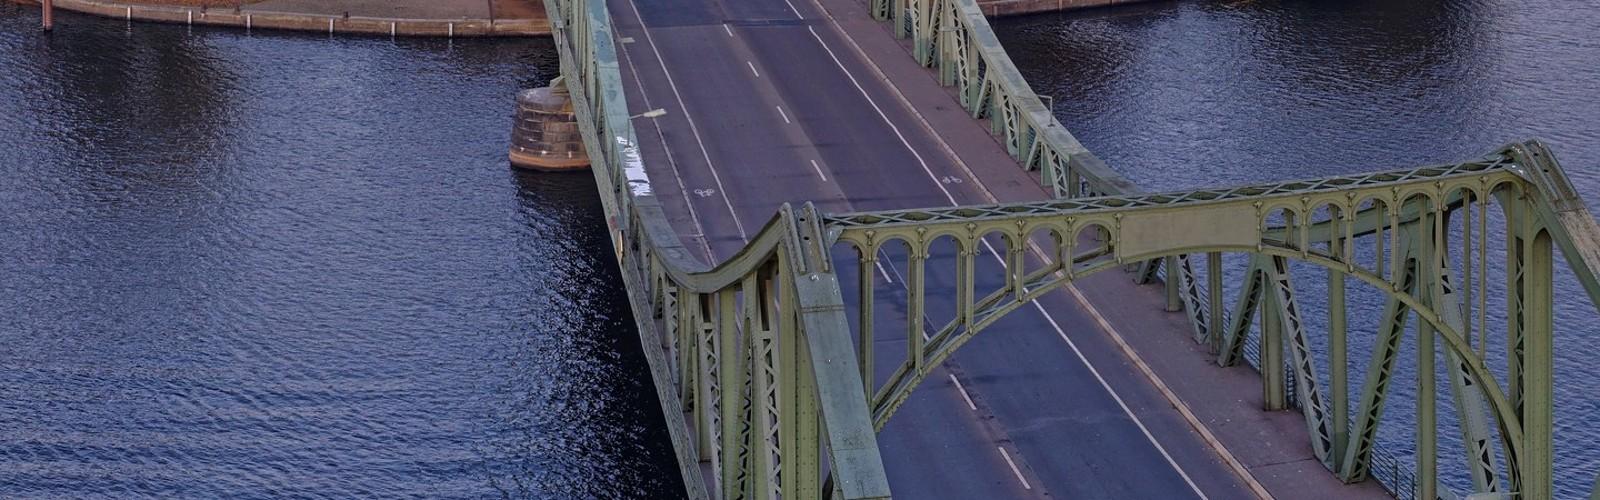 Glienicker Brücke - PMSG André Stiebitz